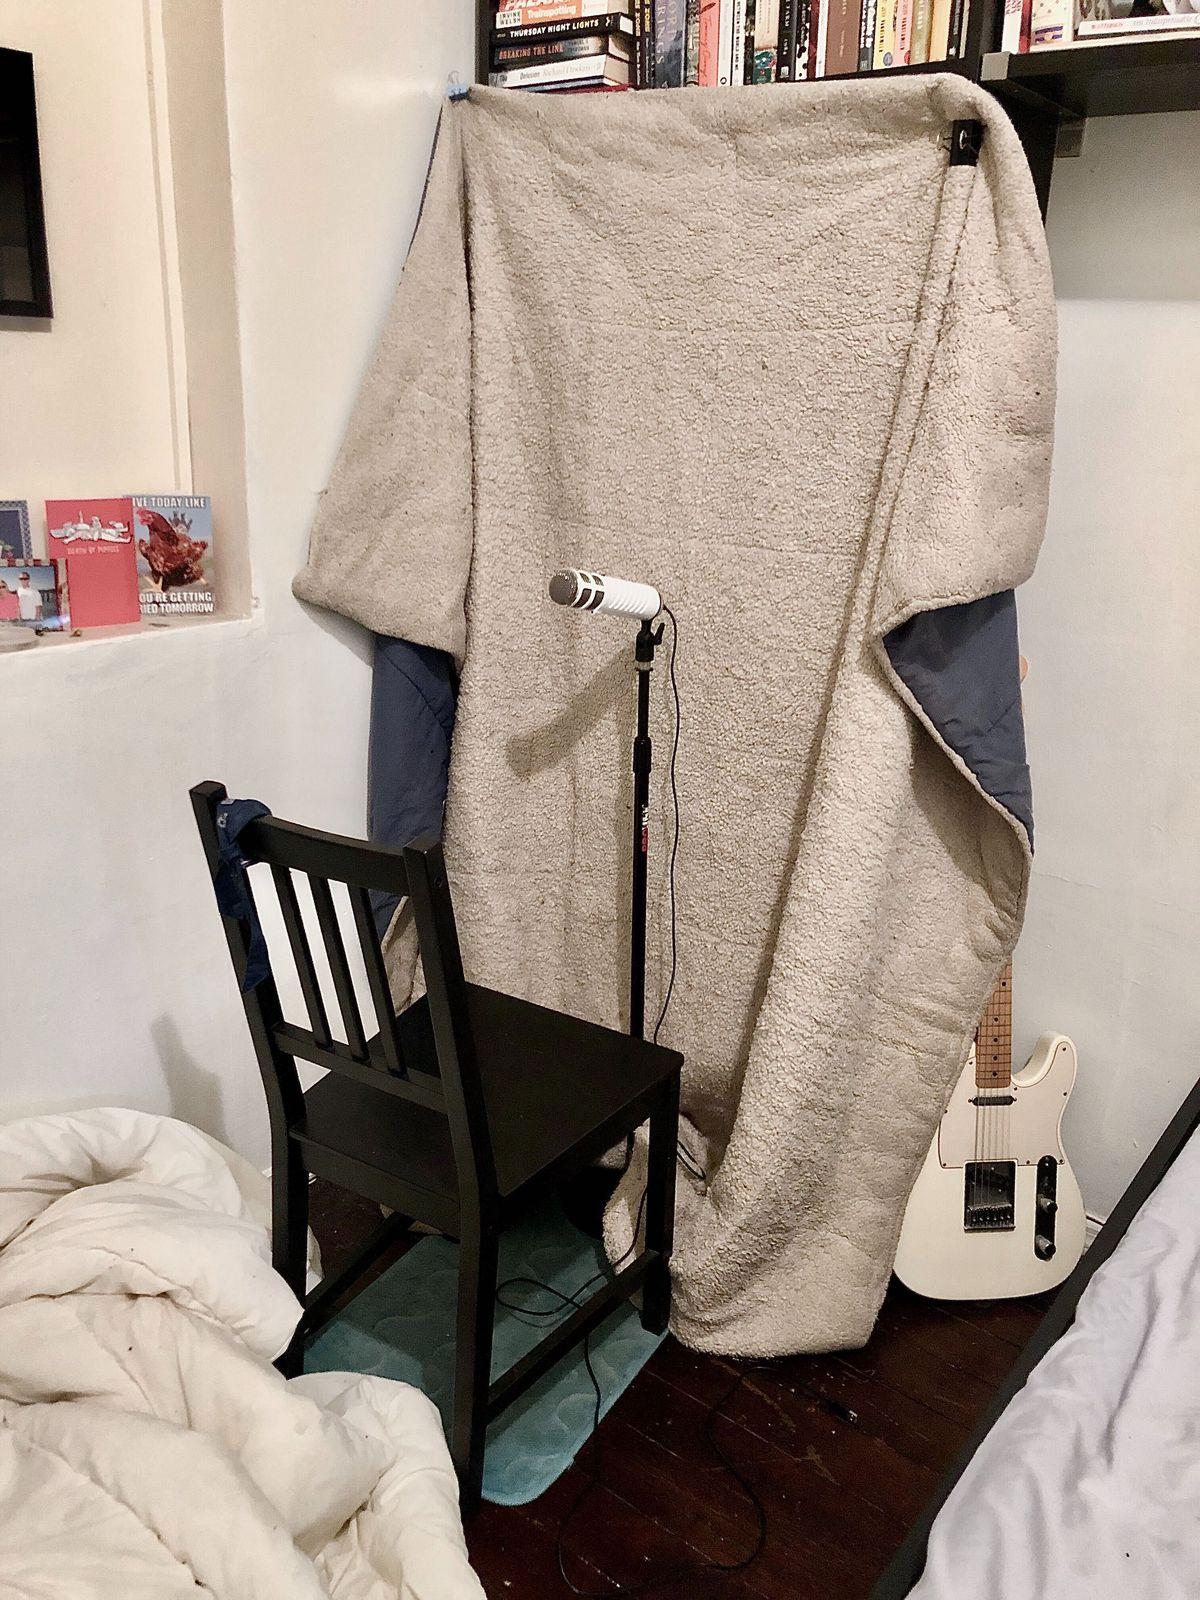 A sad chair facing a sad blanket